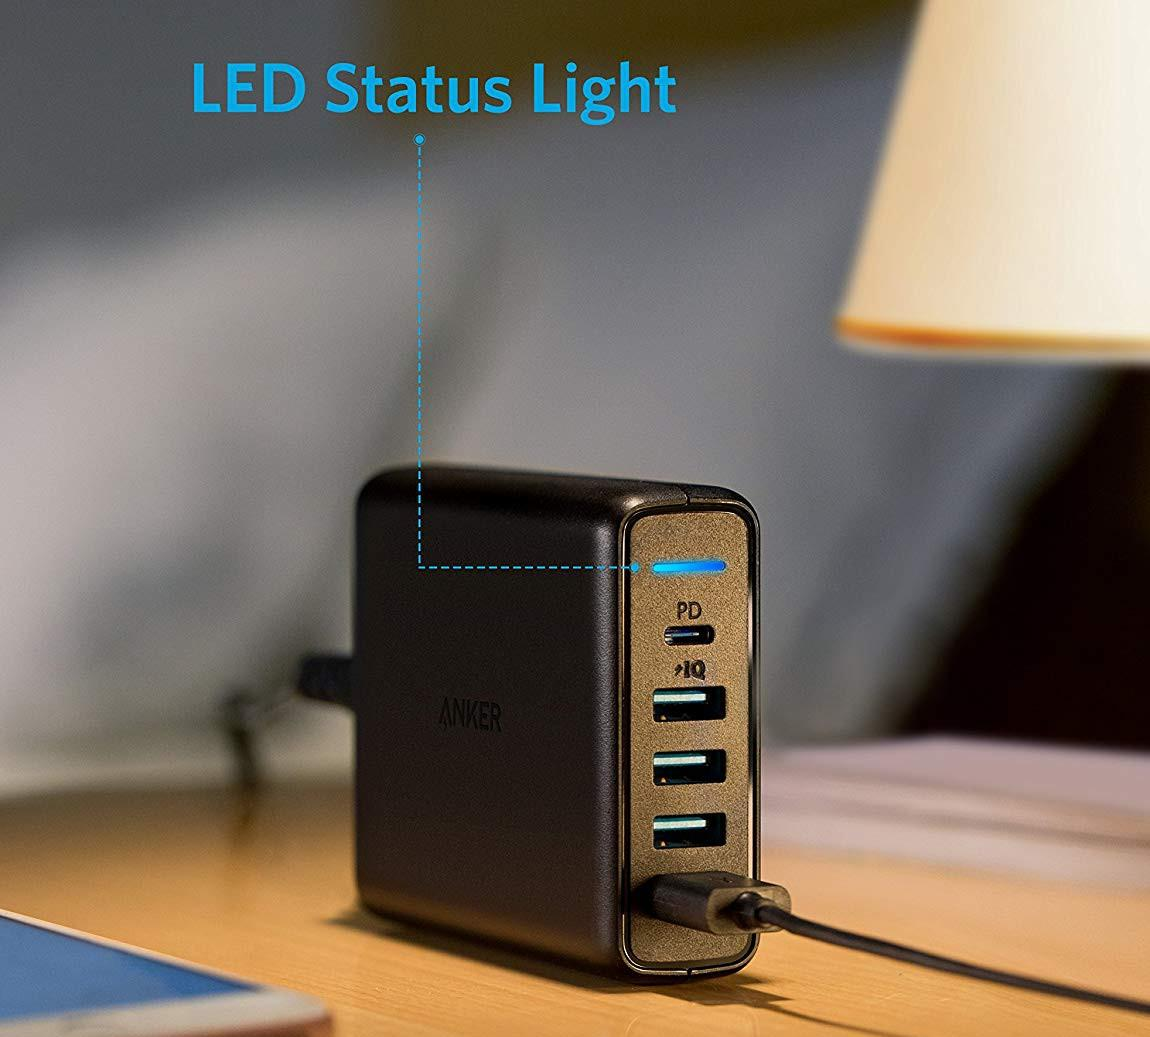 Сетевое зарядное устройство Anker Powerport 5 A2056L11 (Black)